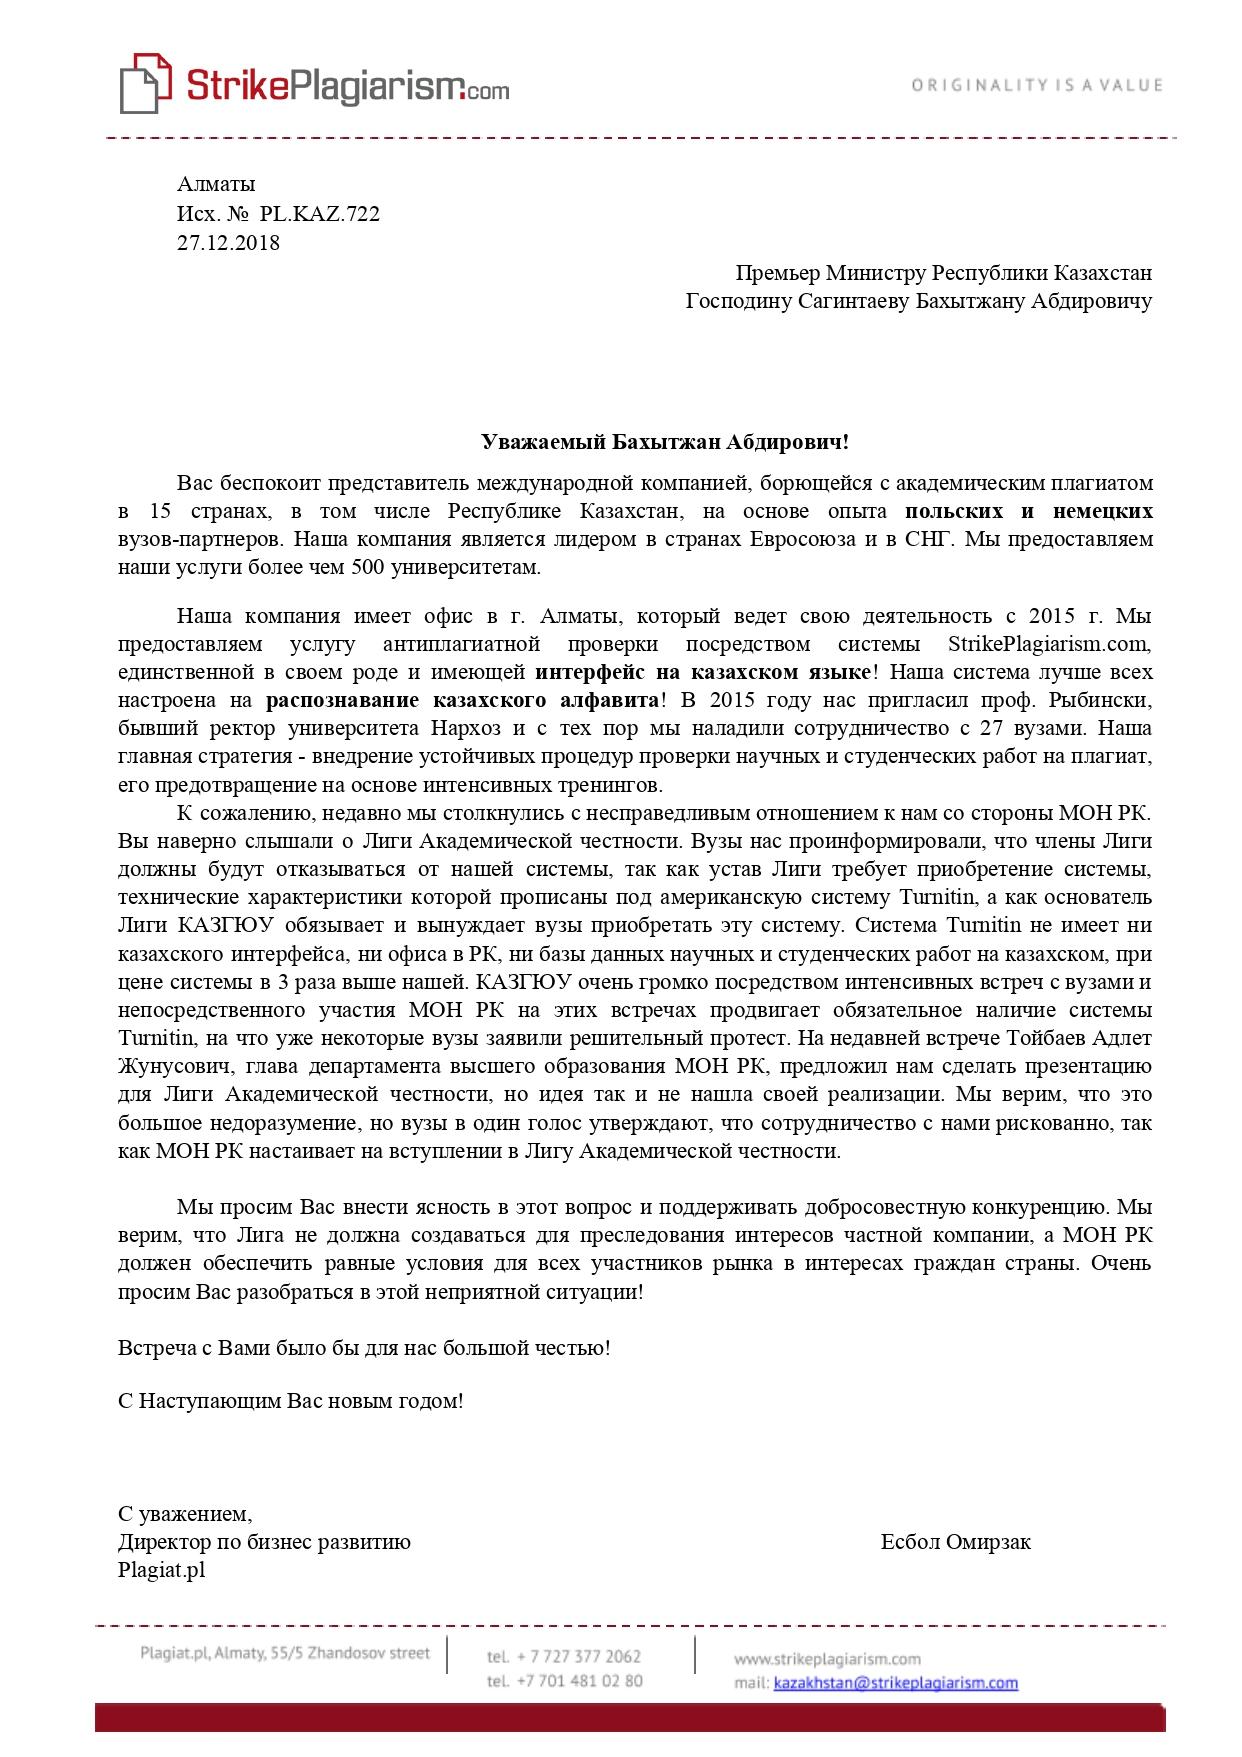 https://inbusiness.kz/ru/images/original/25/images/VAuhVzB4.jpg